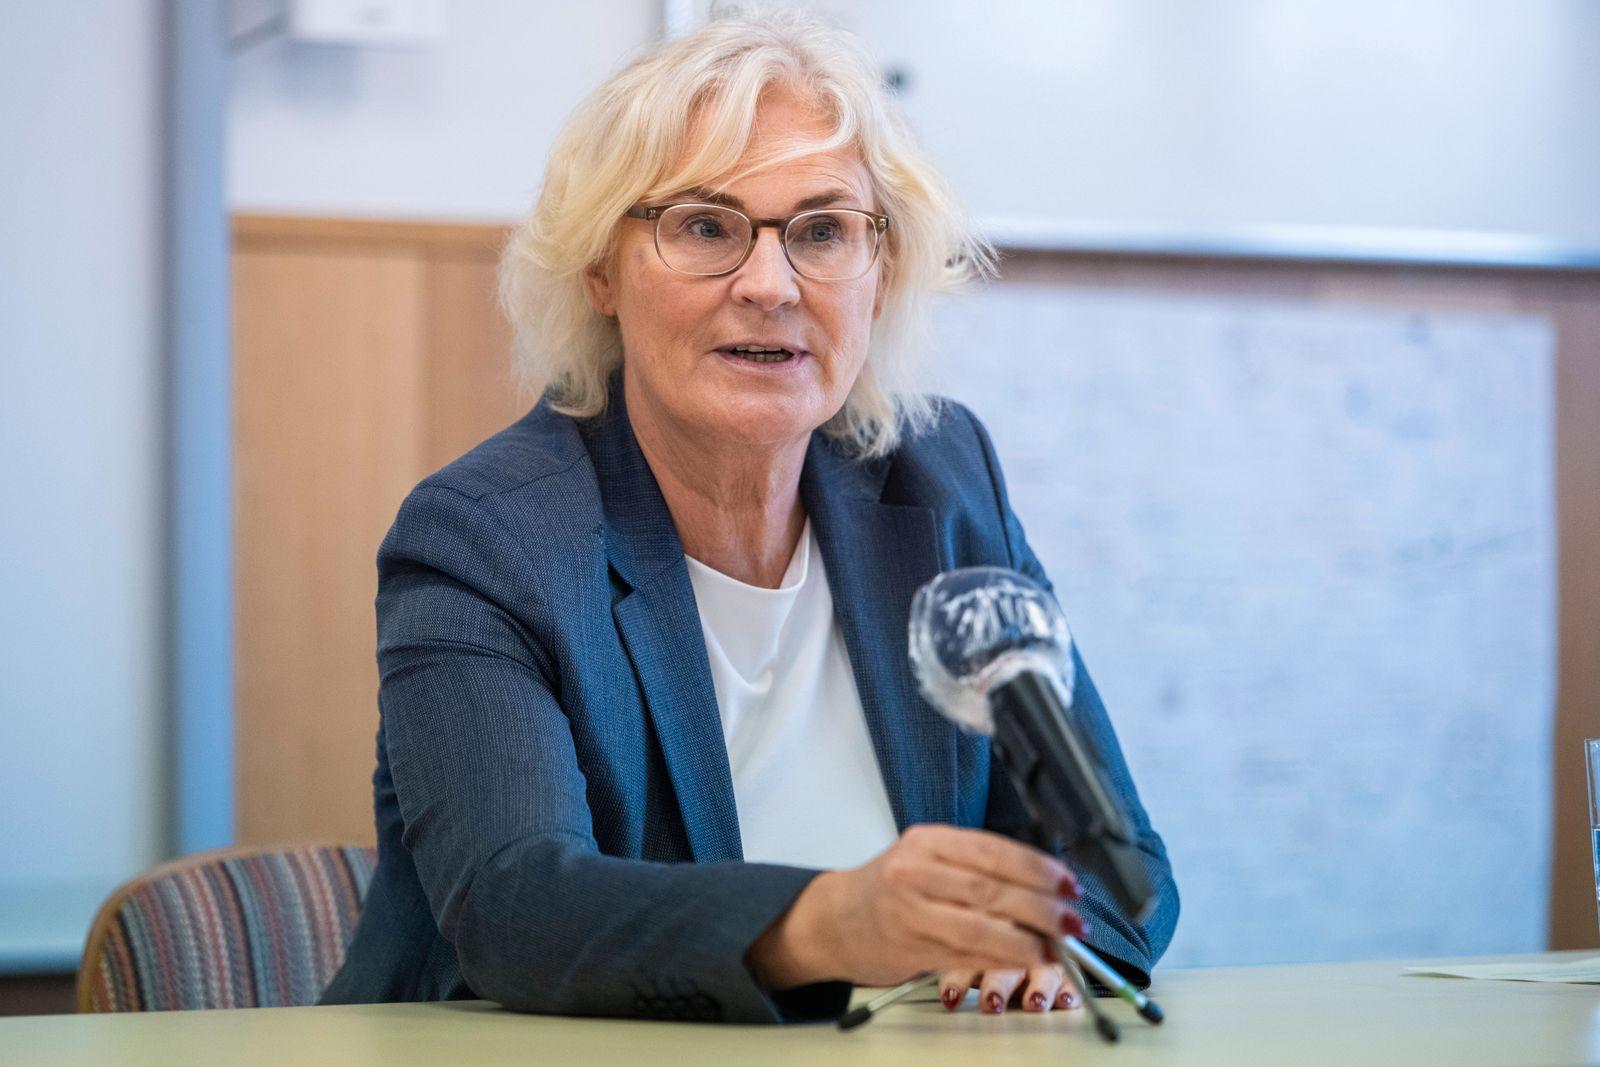 BUNDESJUSTIZMINISTERIN LAMBRECHT BESUCHT STADTTEILZENTRUM ERFURT-HERRENBERG 12/10/2020 - Erfurt: Die Bundesministerin d